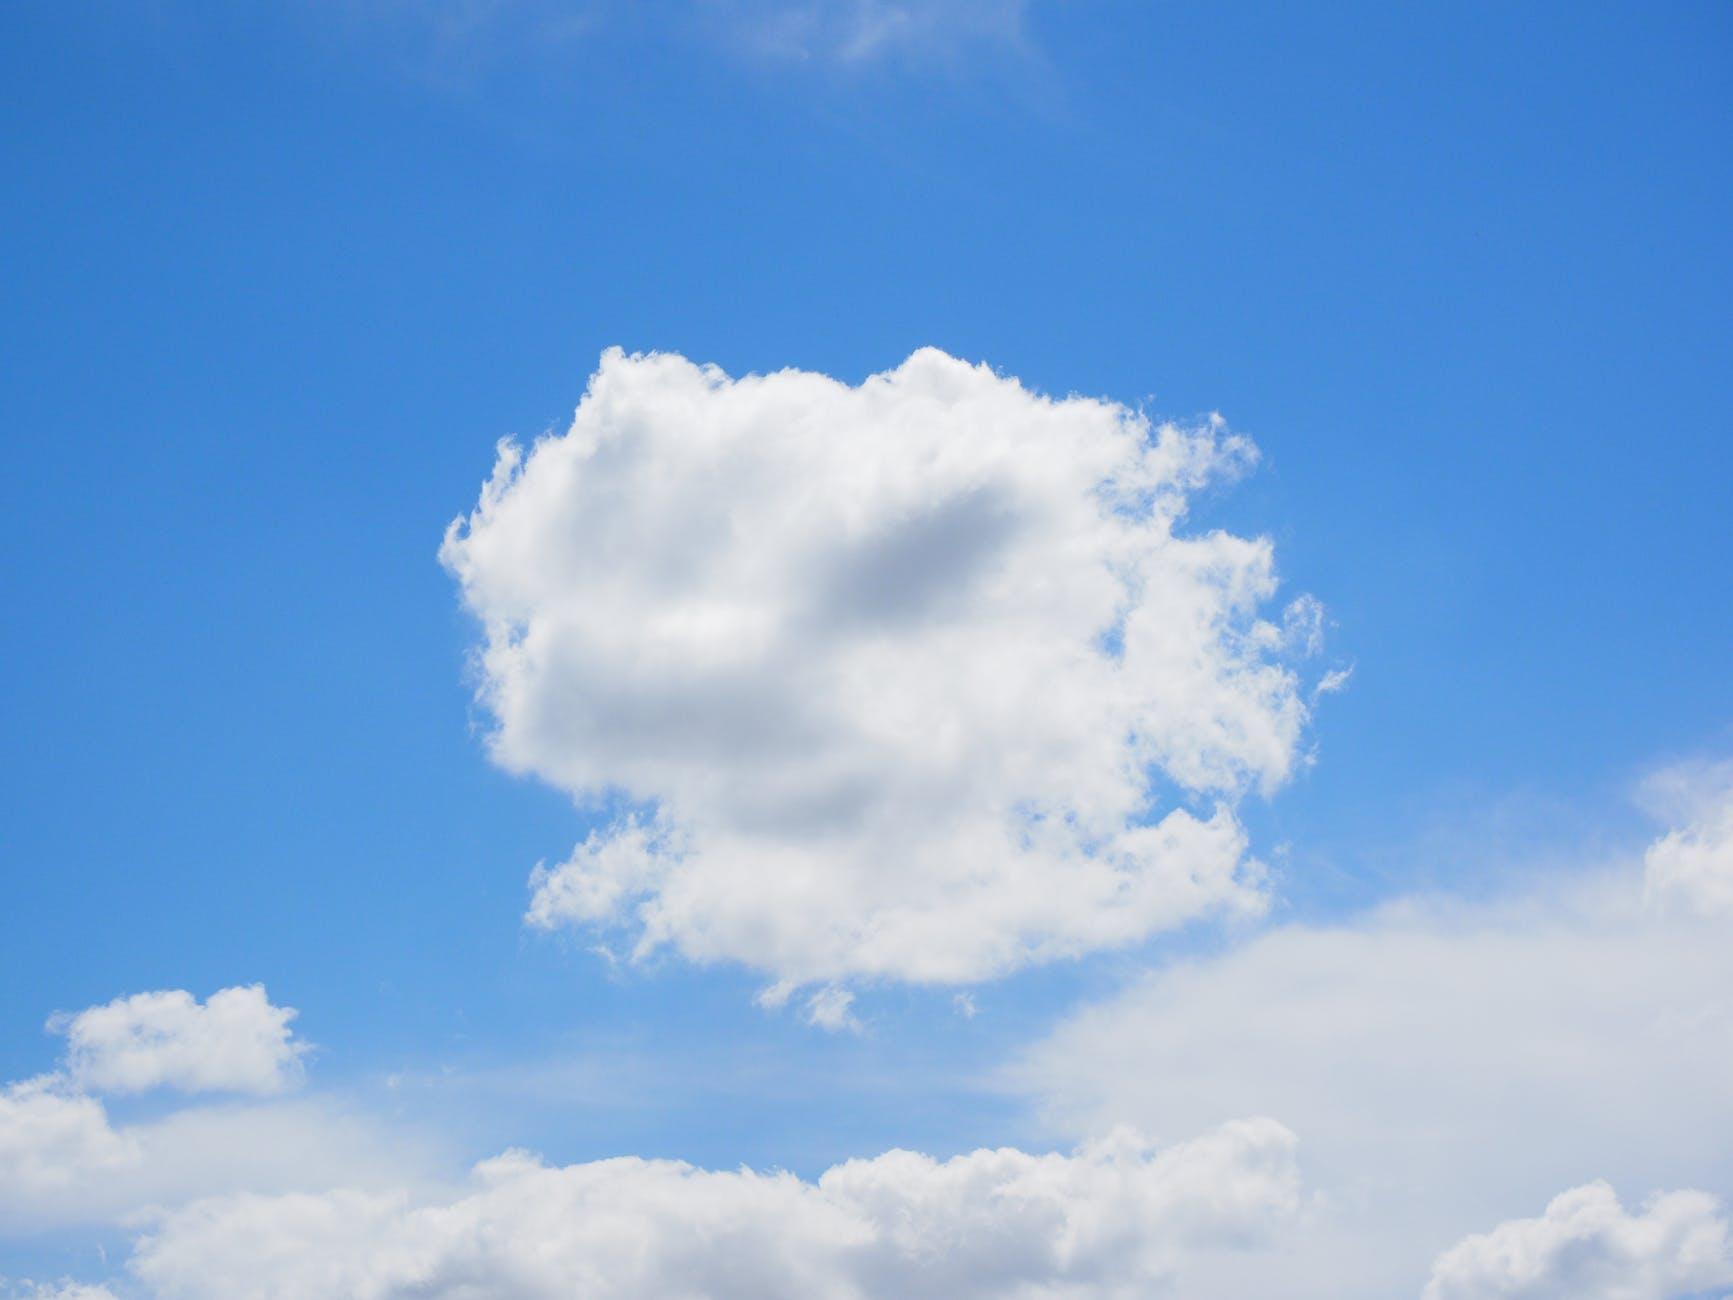 atmosphere blue blue sky bright